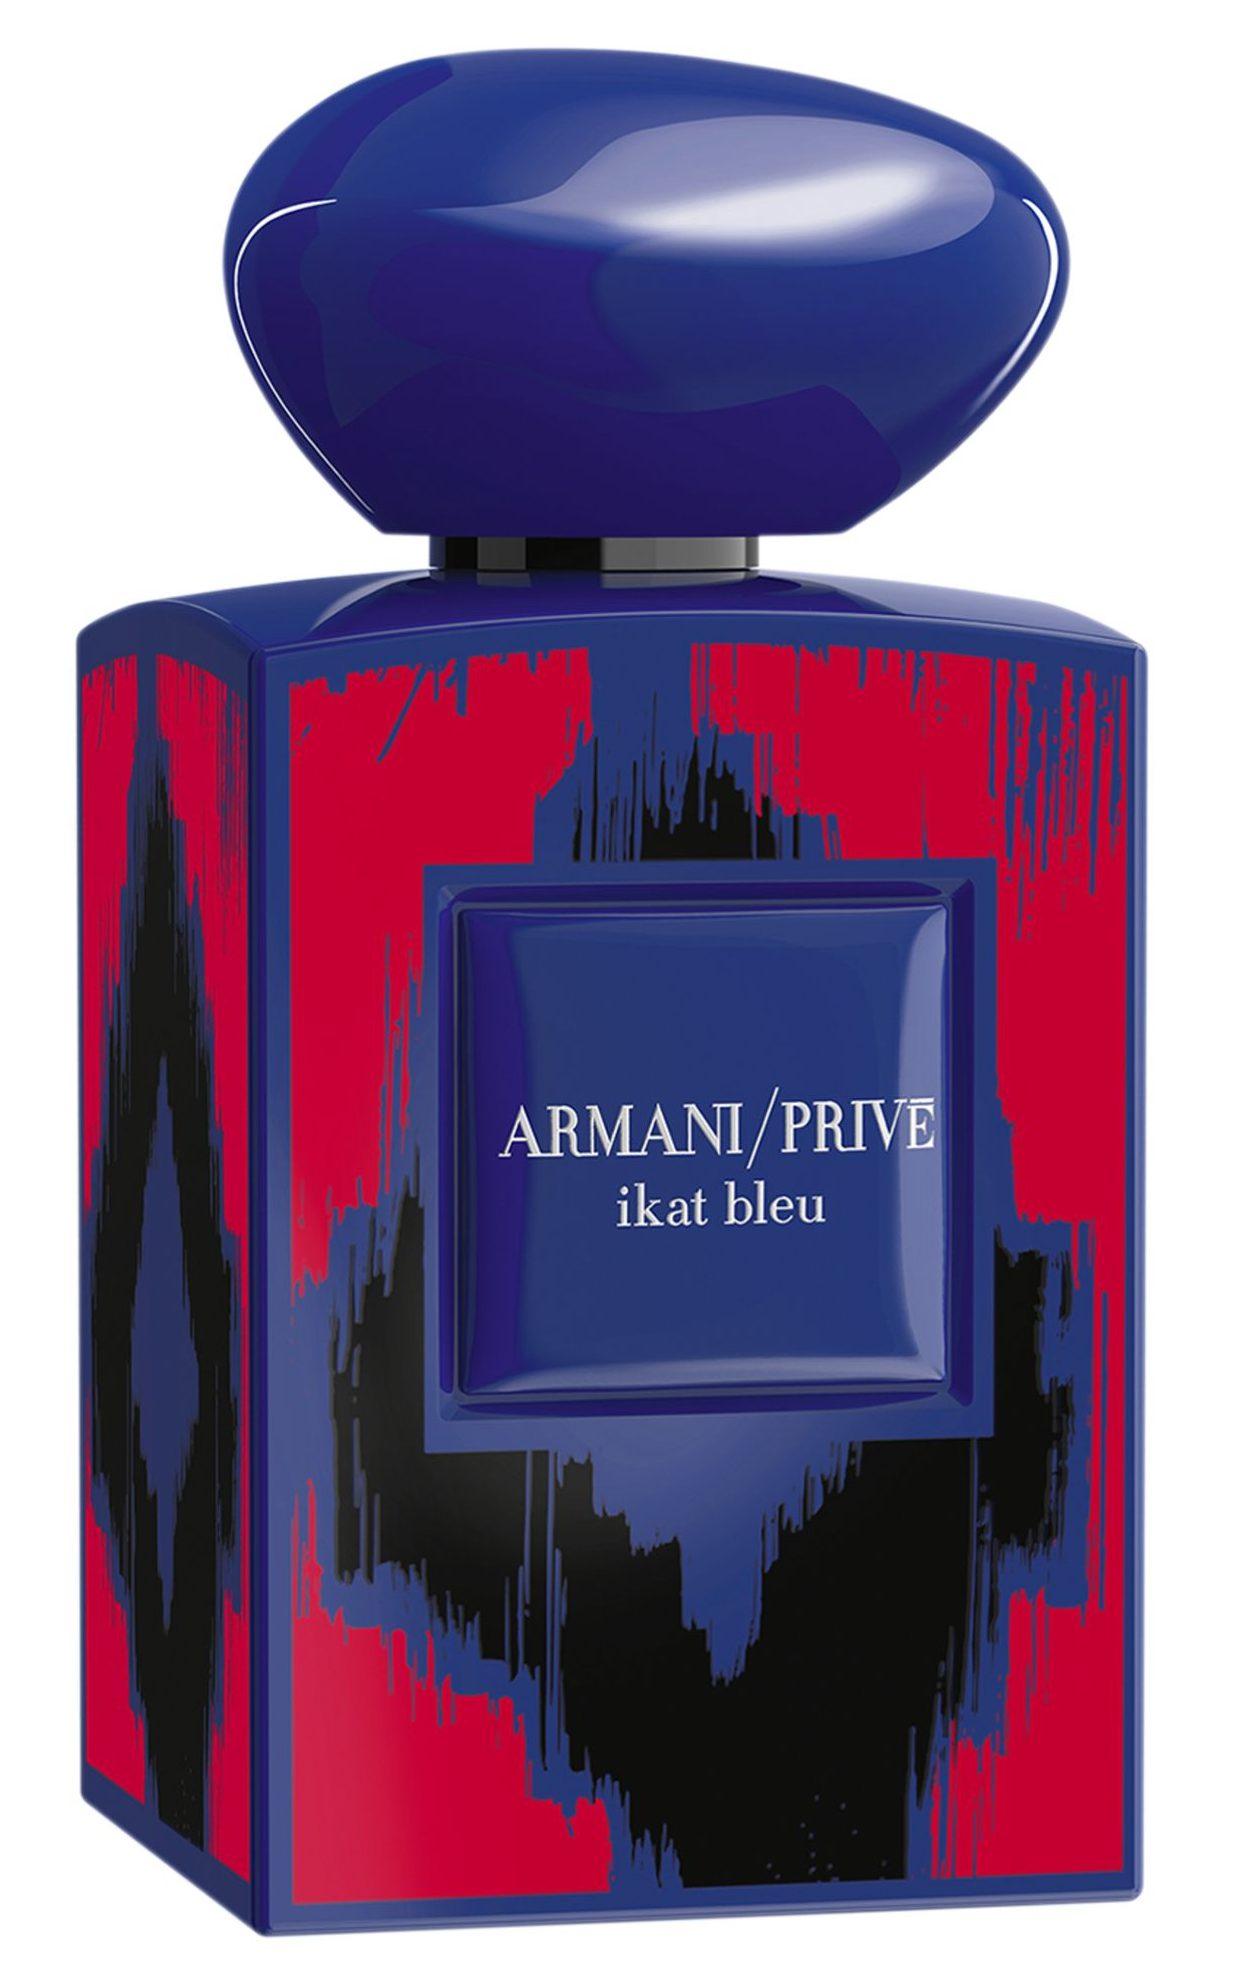 ARMANI_PRIVE_IKAT_BLEU